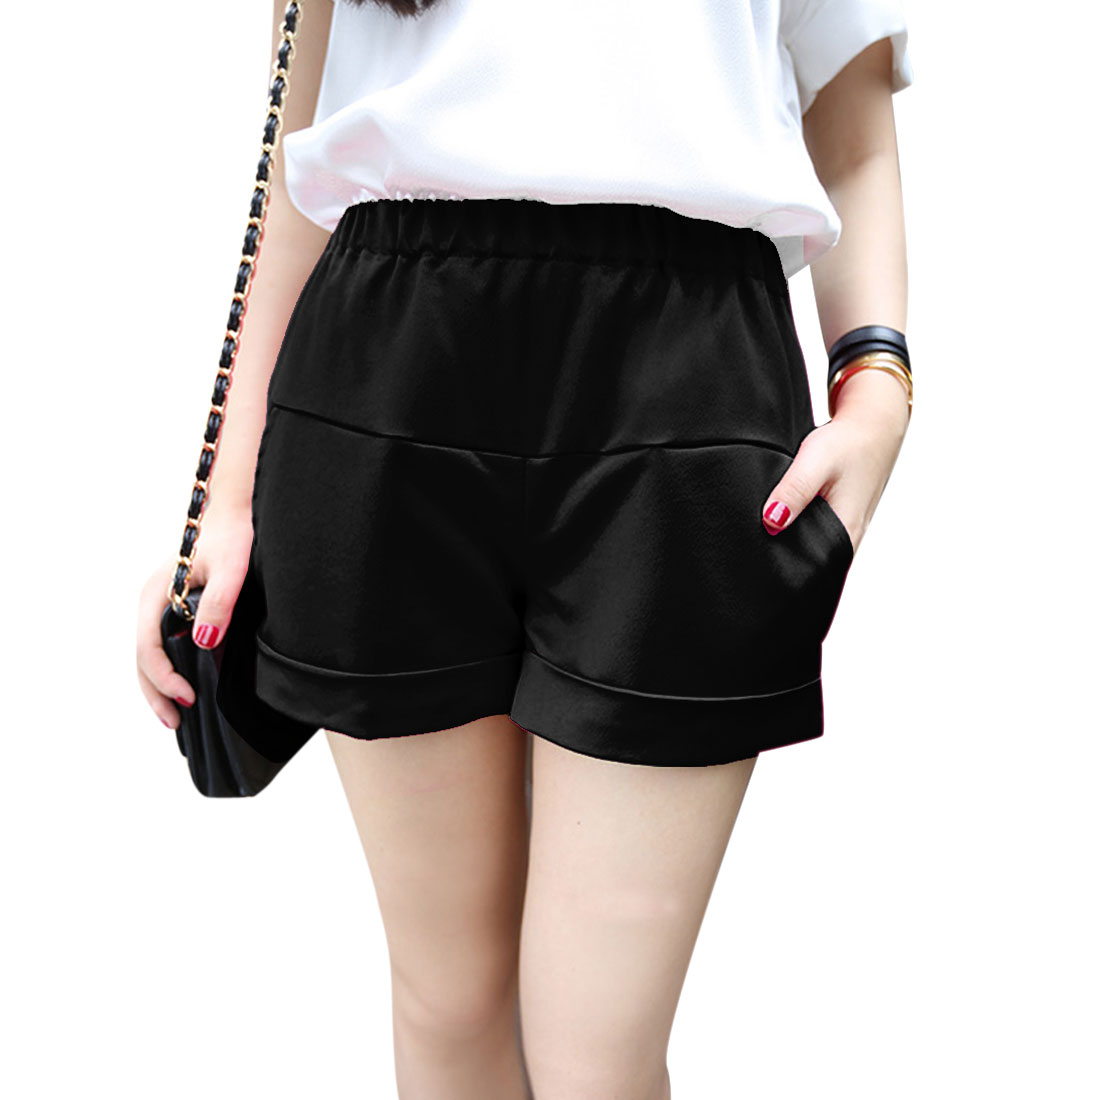 Women's Front Two Slant Pockets Semi Sheer Design Stylish Shorts Black S